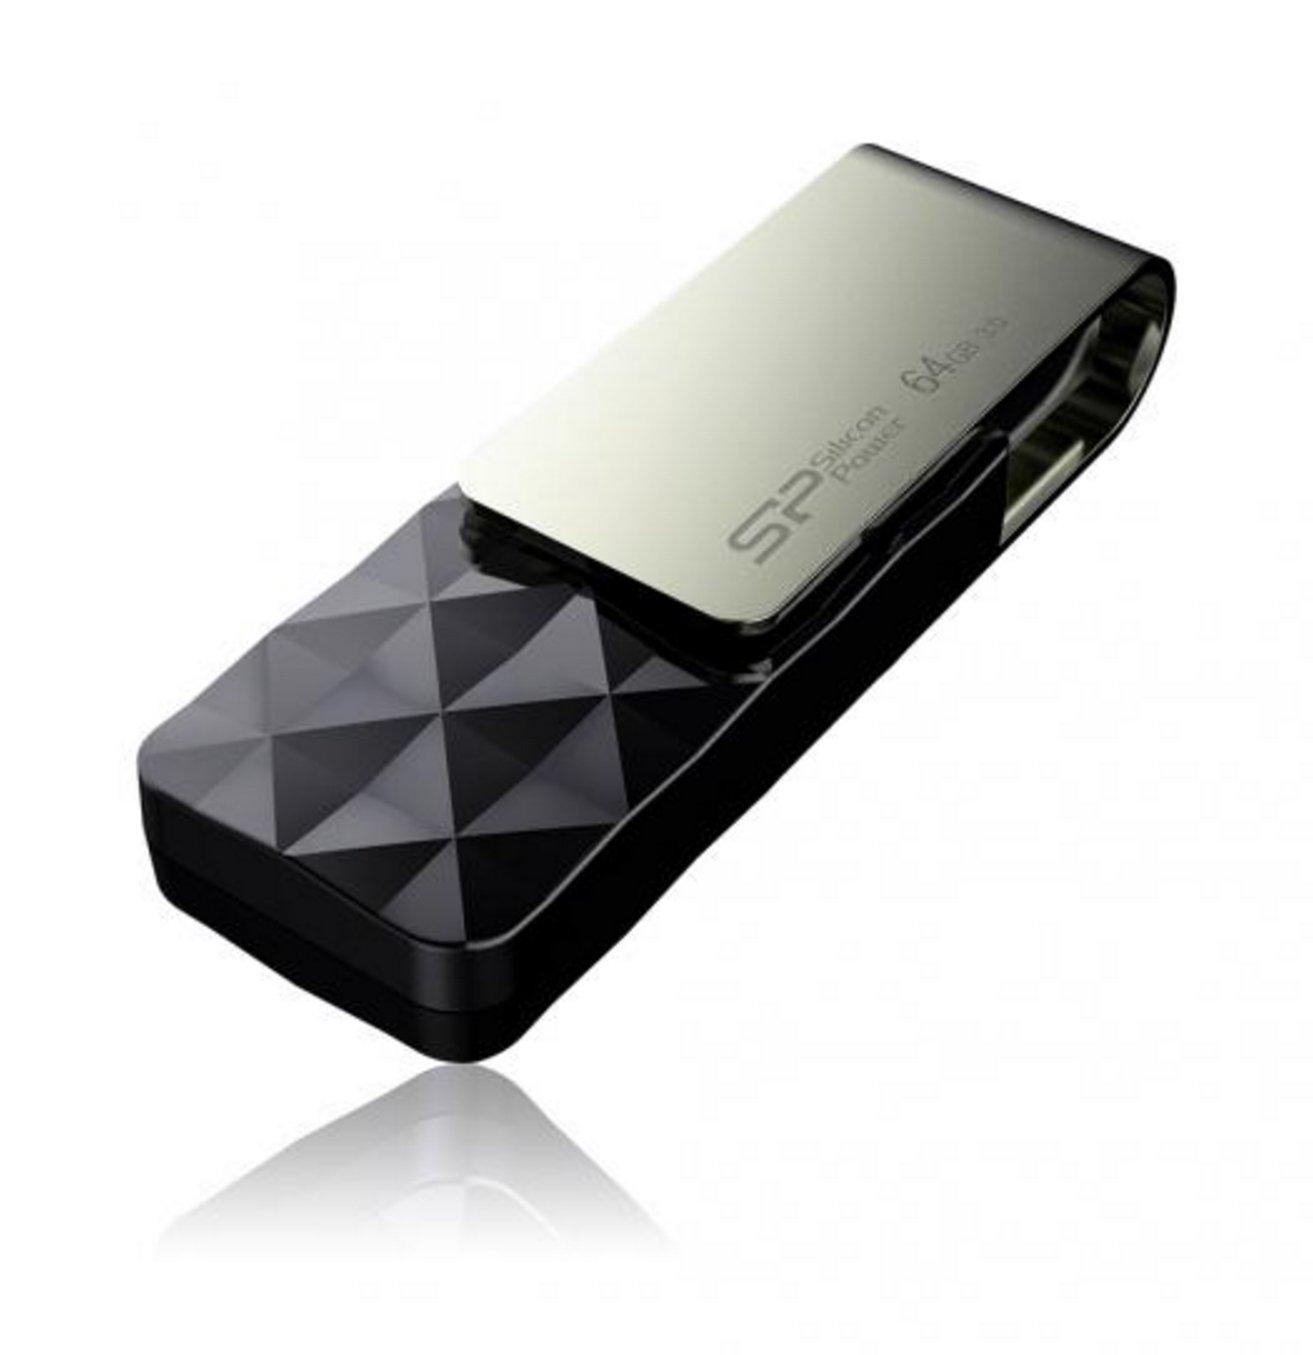 Silicon Power 64GB Blaze B30 USB 3.0 Swivel Flash Drive, Black (SP064GBUF3B30V1K) by Silicon Power (Image #3)